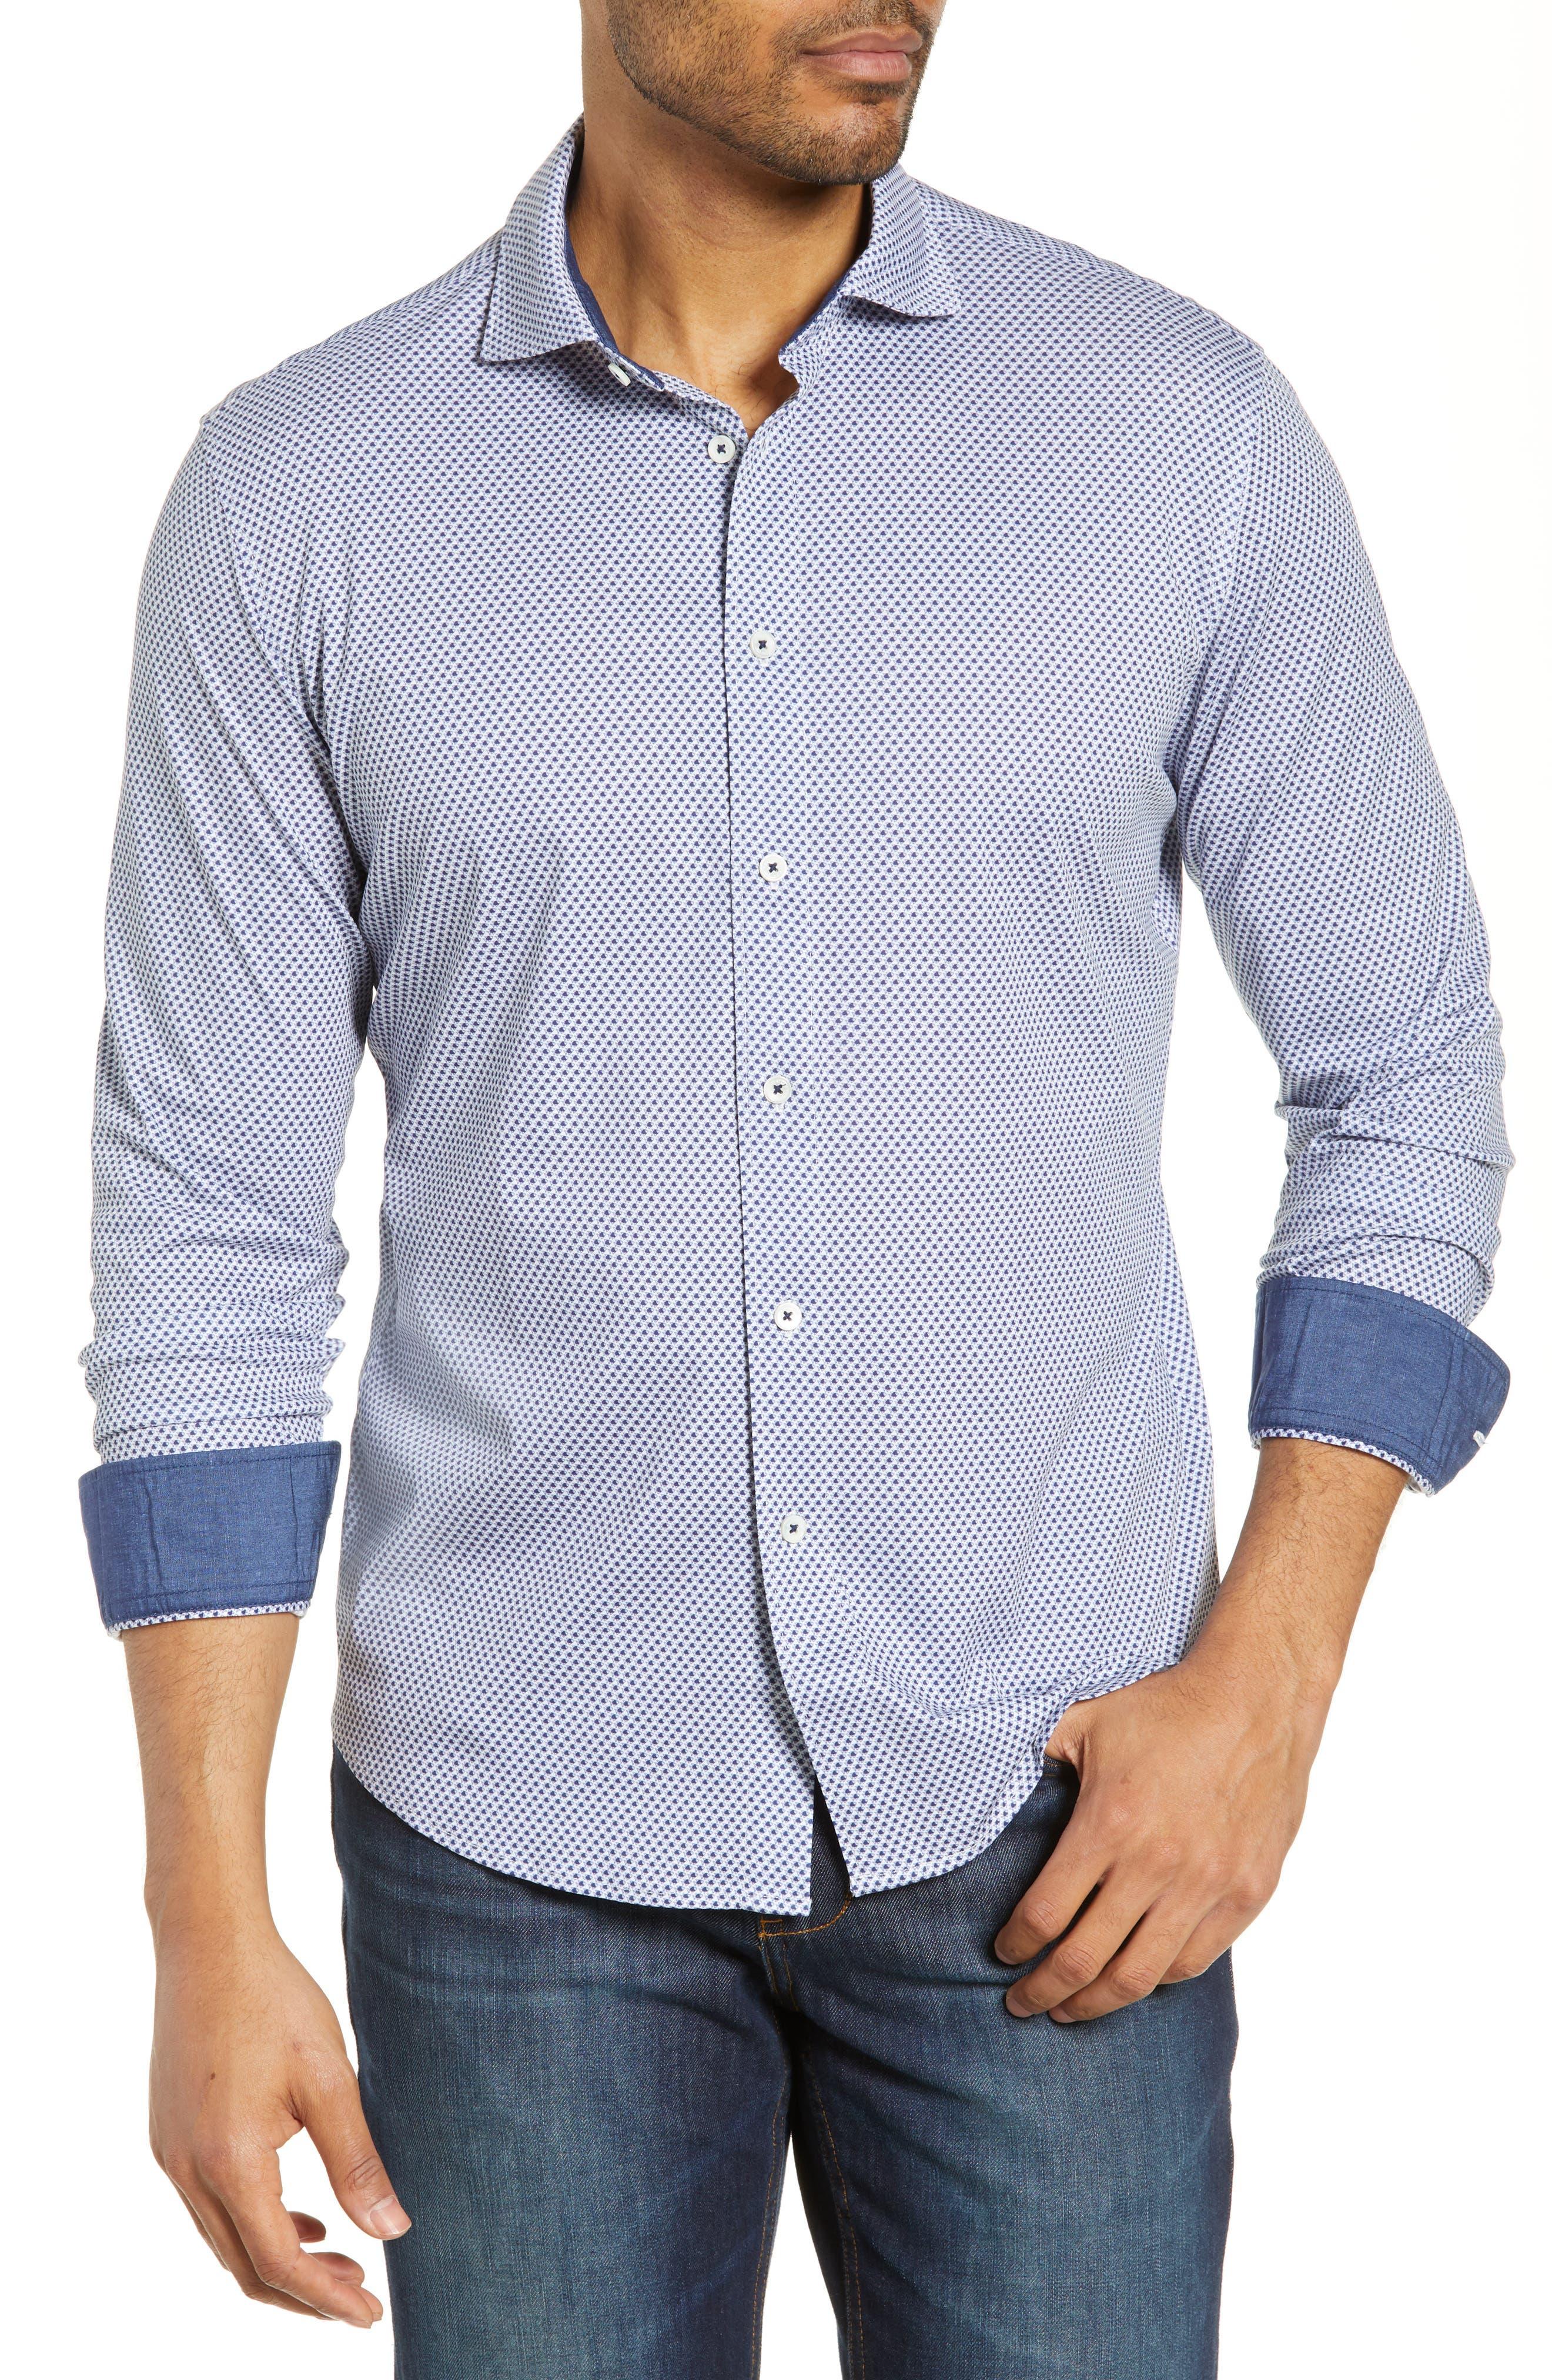 men's bugatchi knit shirt